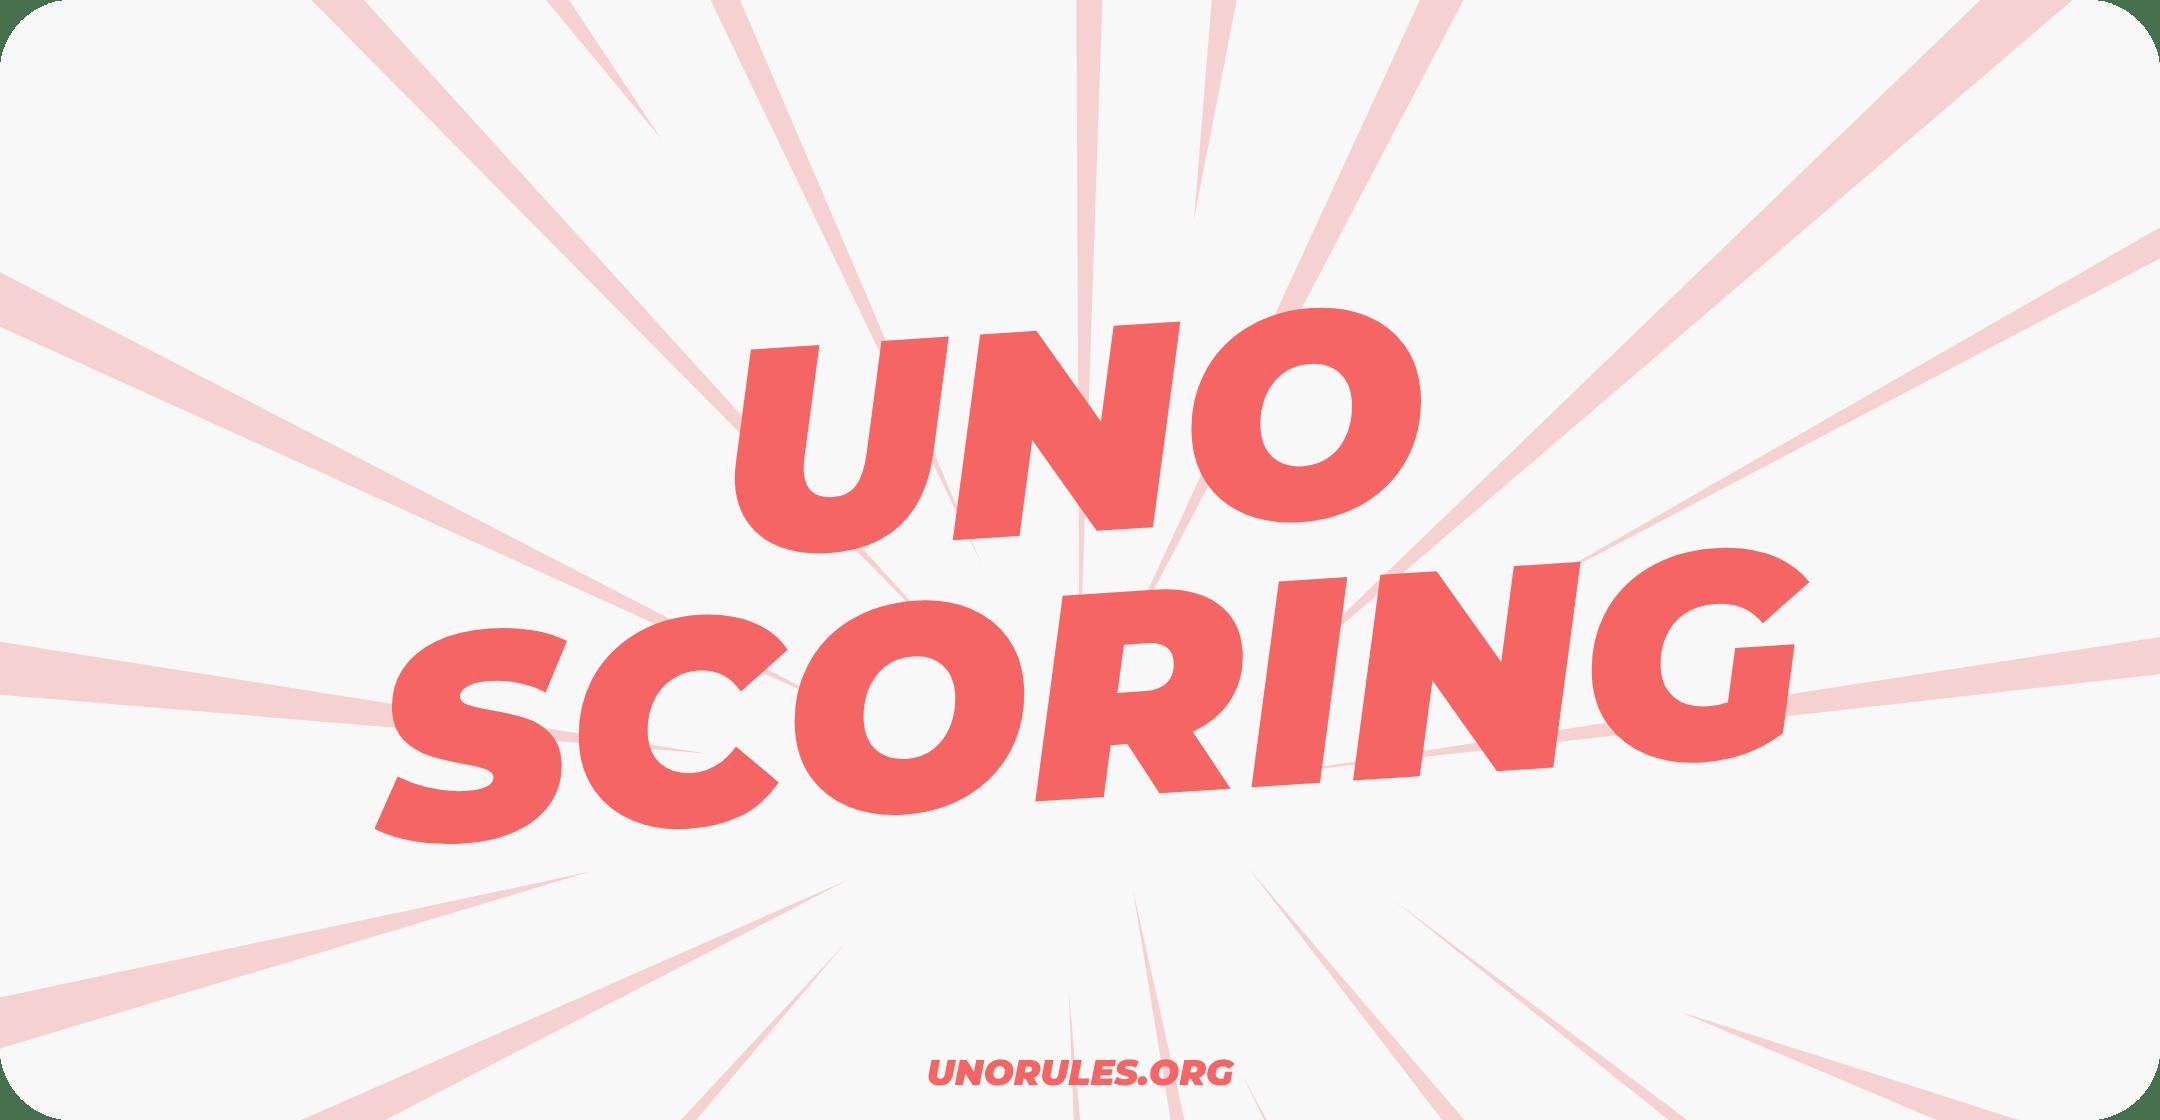 Uno scoring